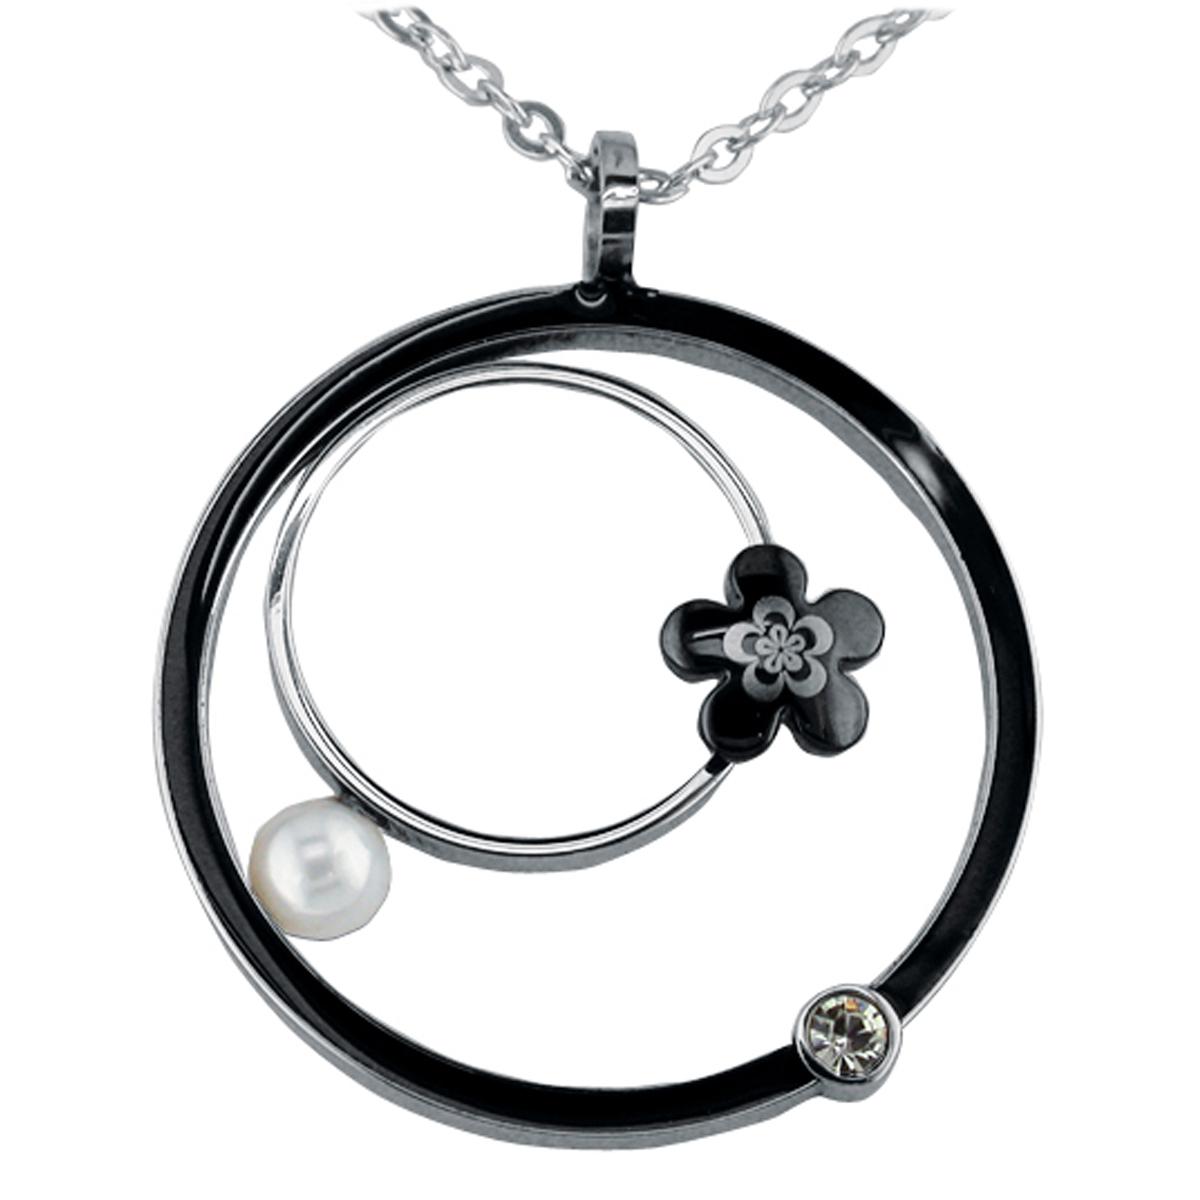 Collier acier \'Calypso\' noir (fleur) - [K6003]